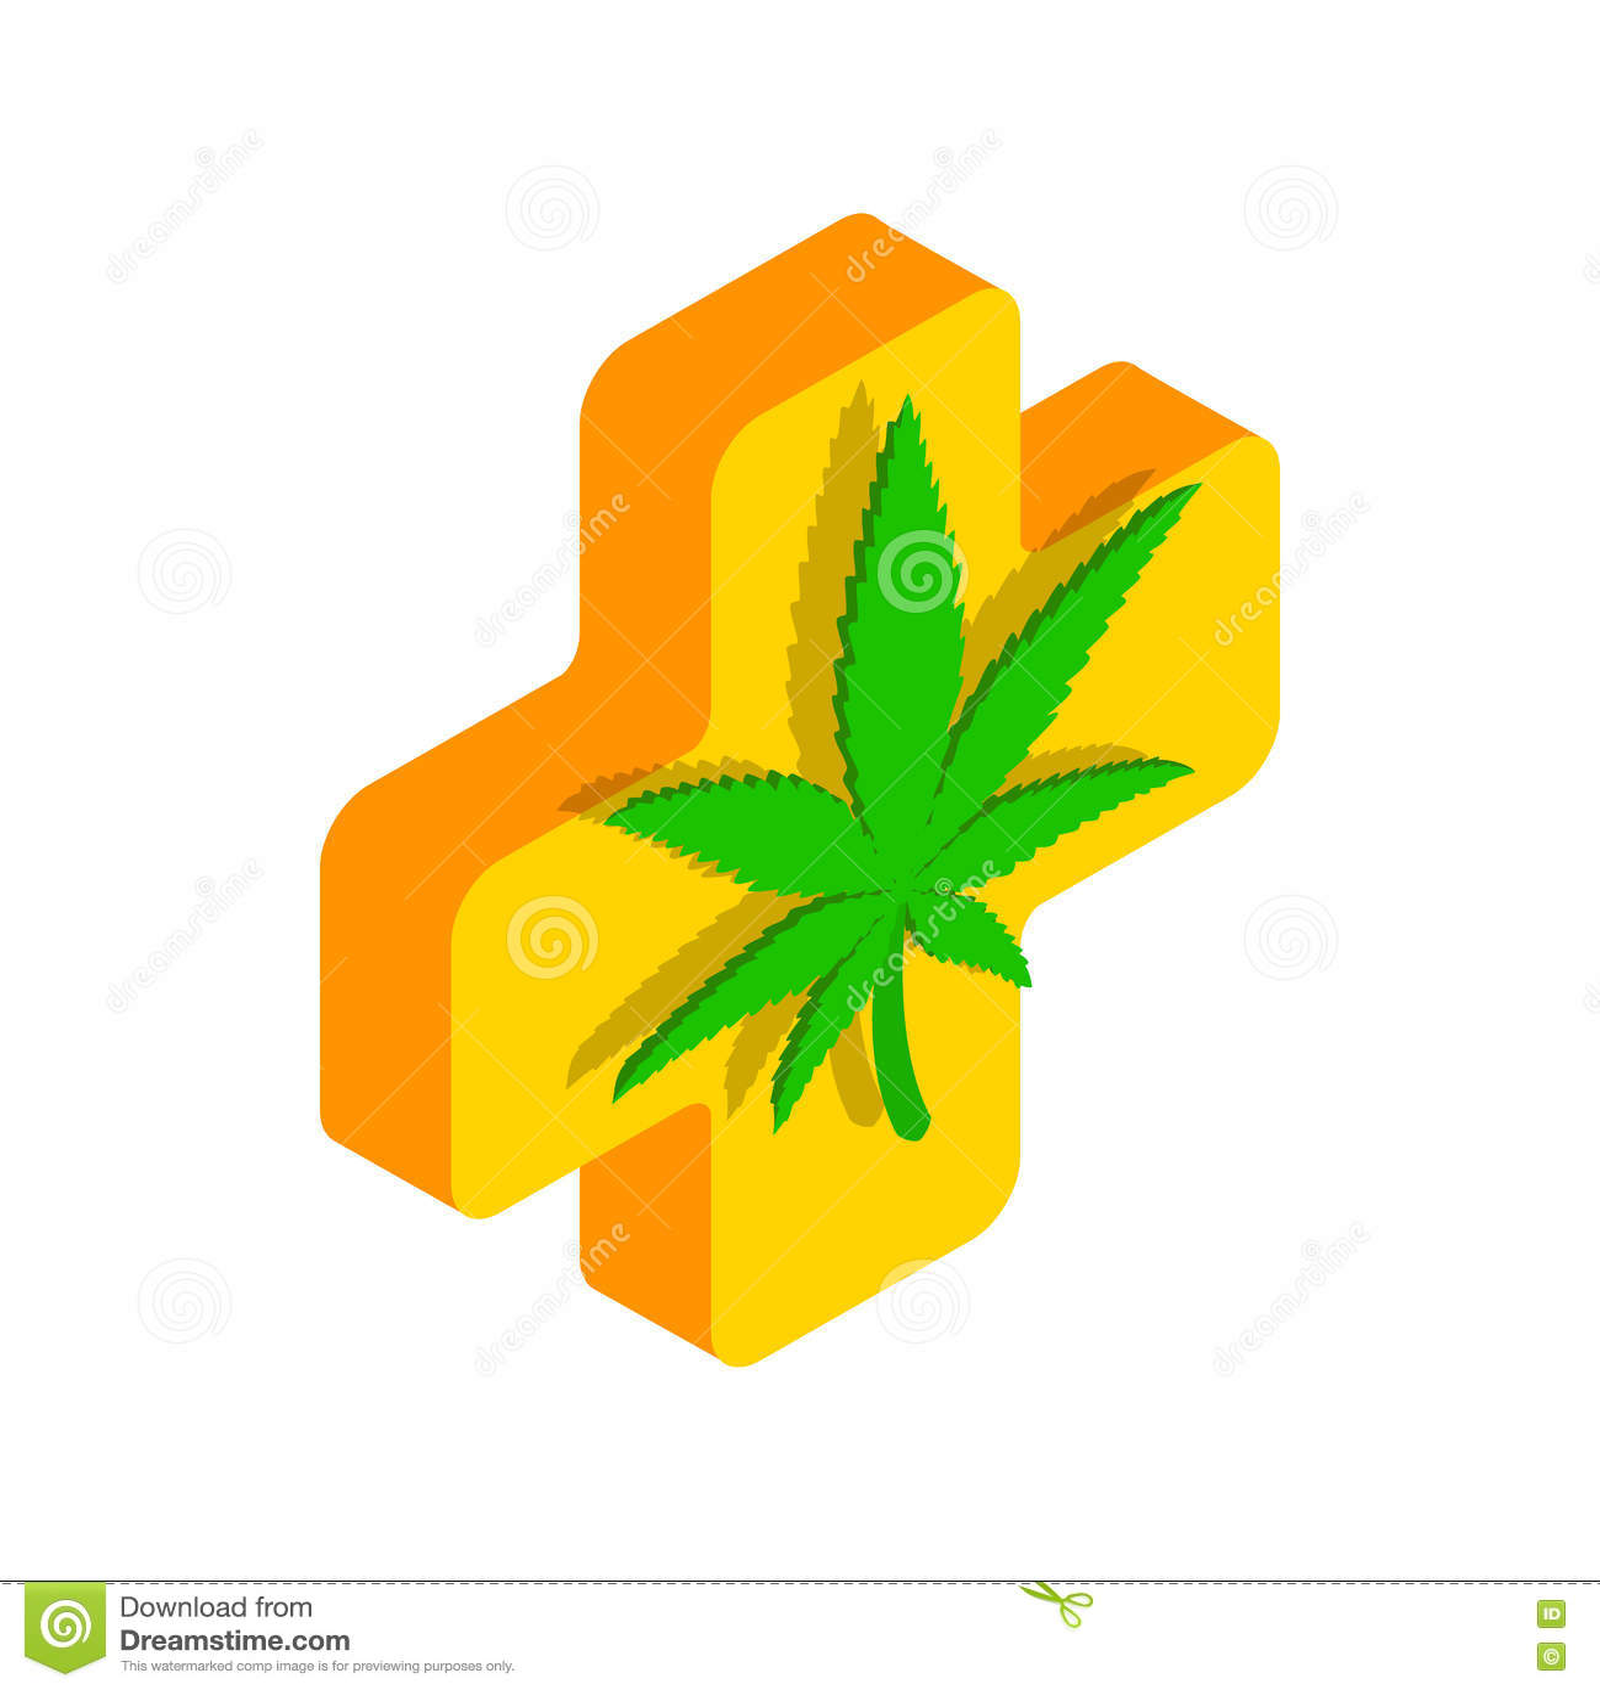 Marijuana leaf with a cross icon stock vector illustration 79521173 marijuana leaf with a cross icon biocorpaavc